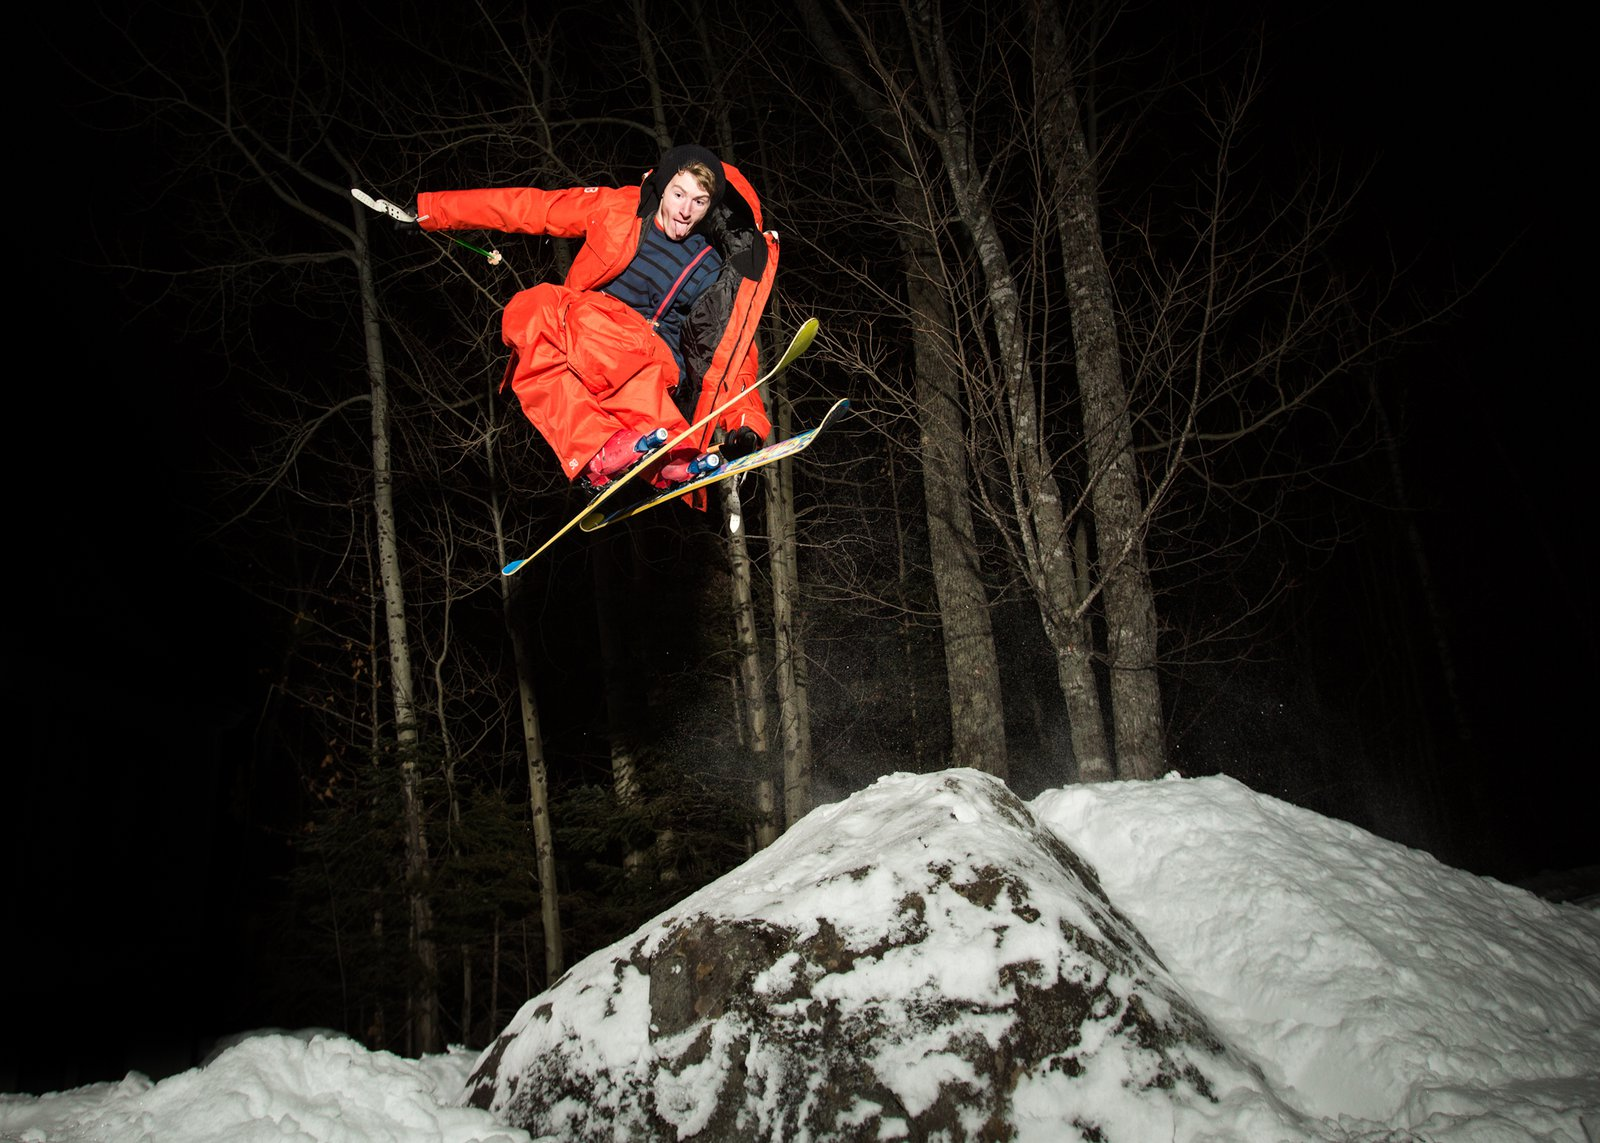 I ski?